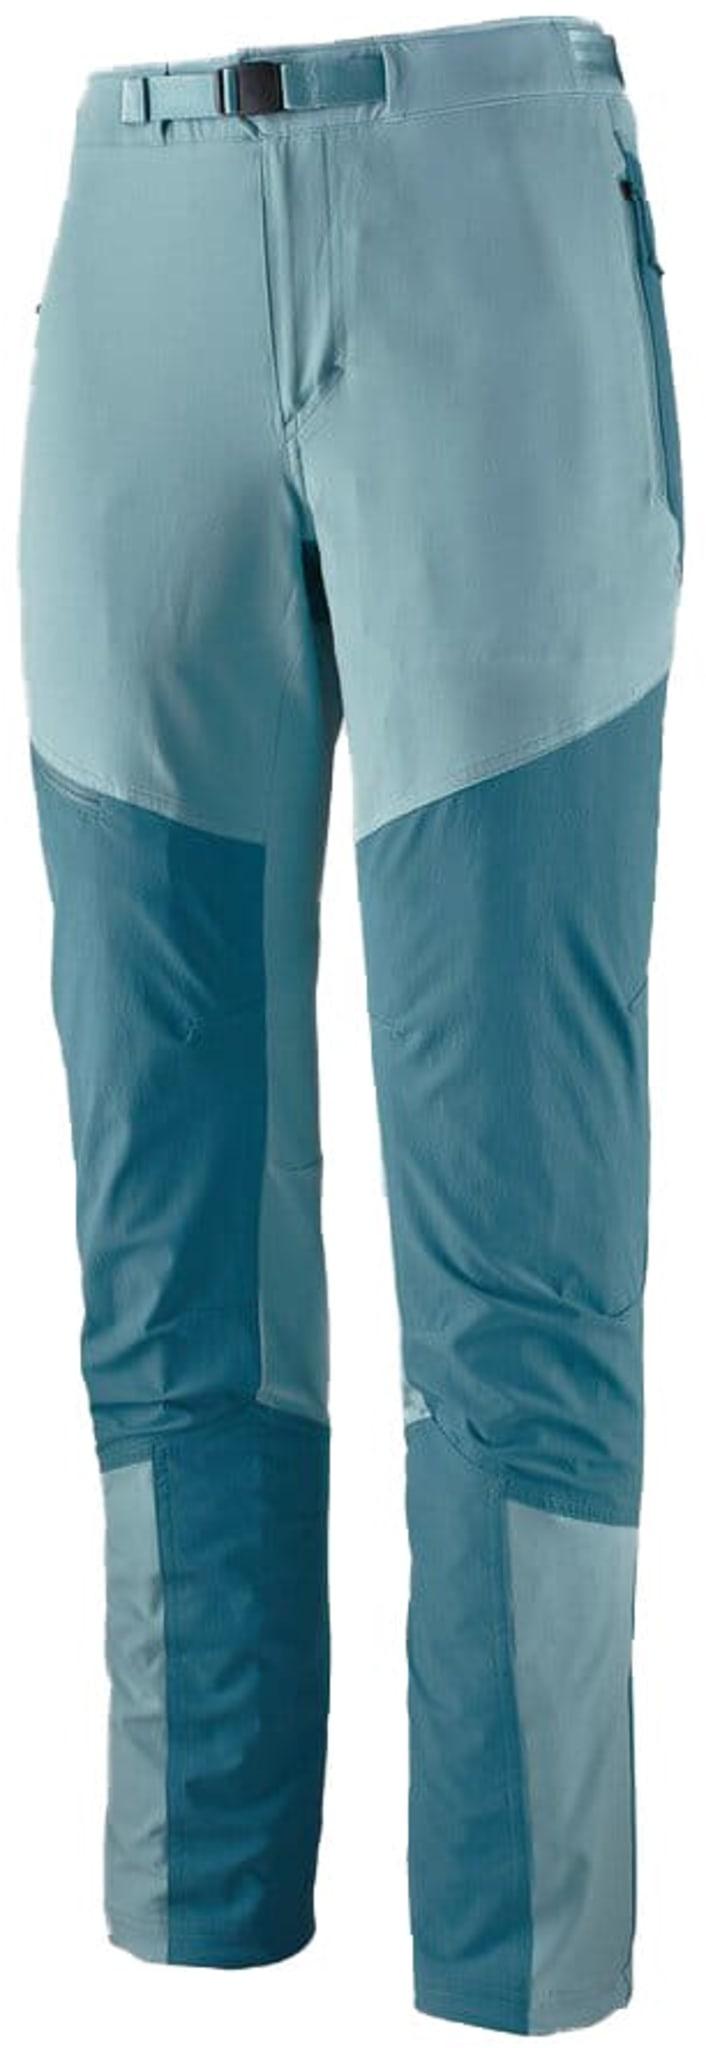 Altvia Alpine Pants Ws